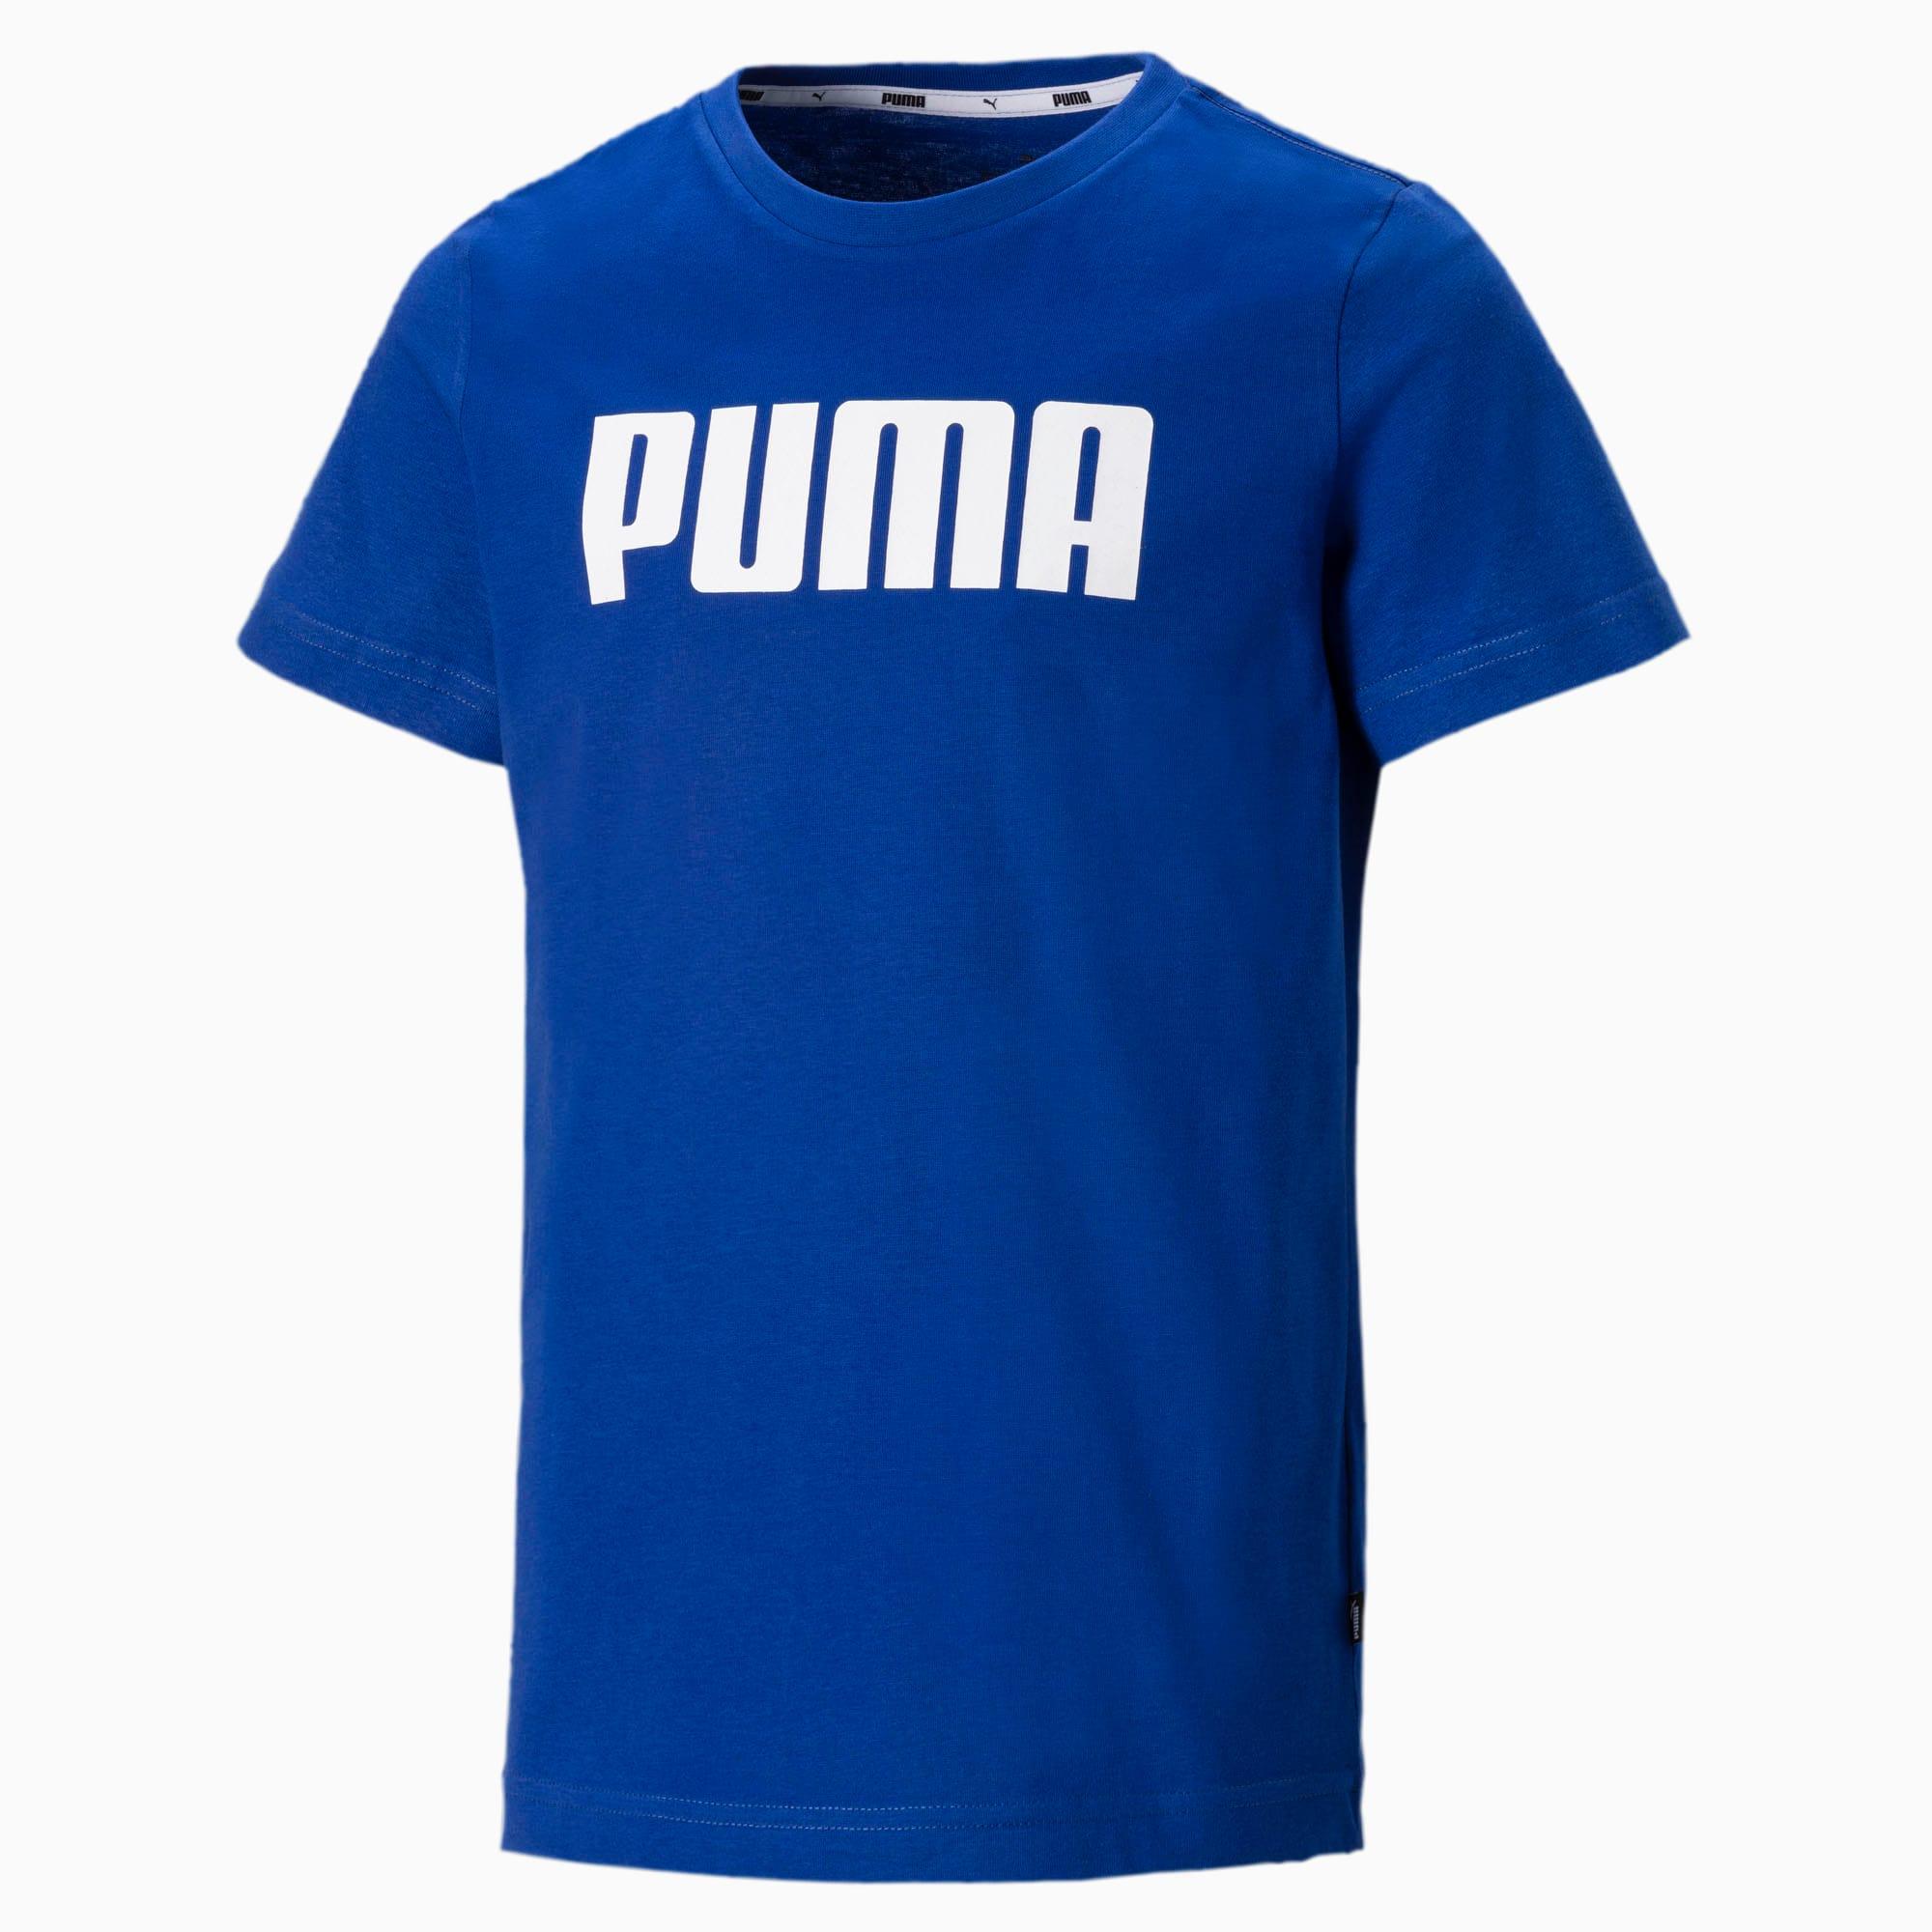 Camisetas Puma, infantiles 2 colores a elegir